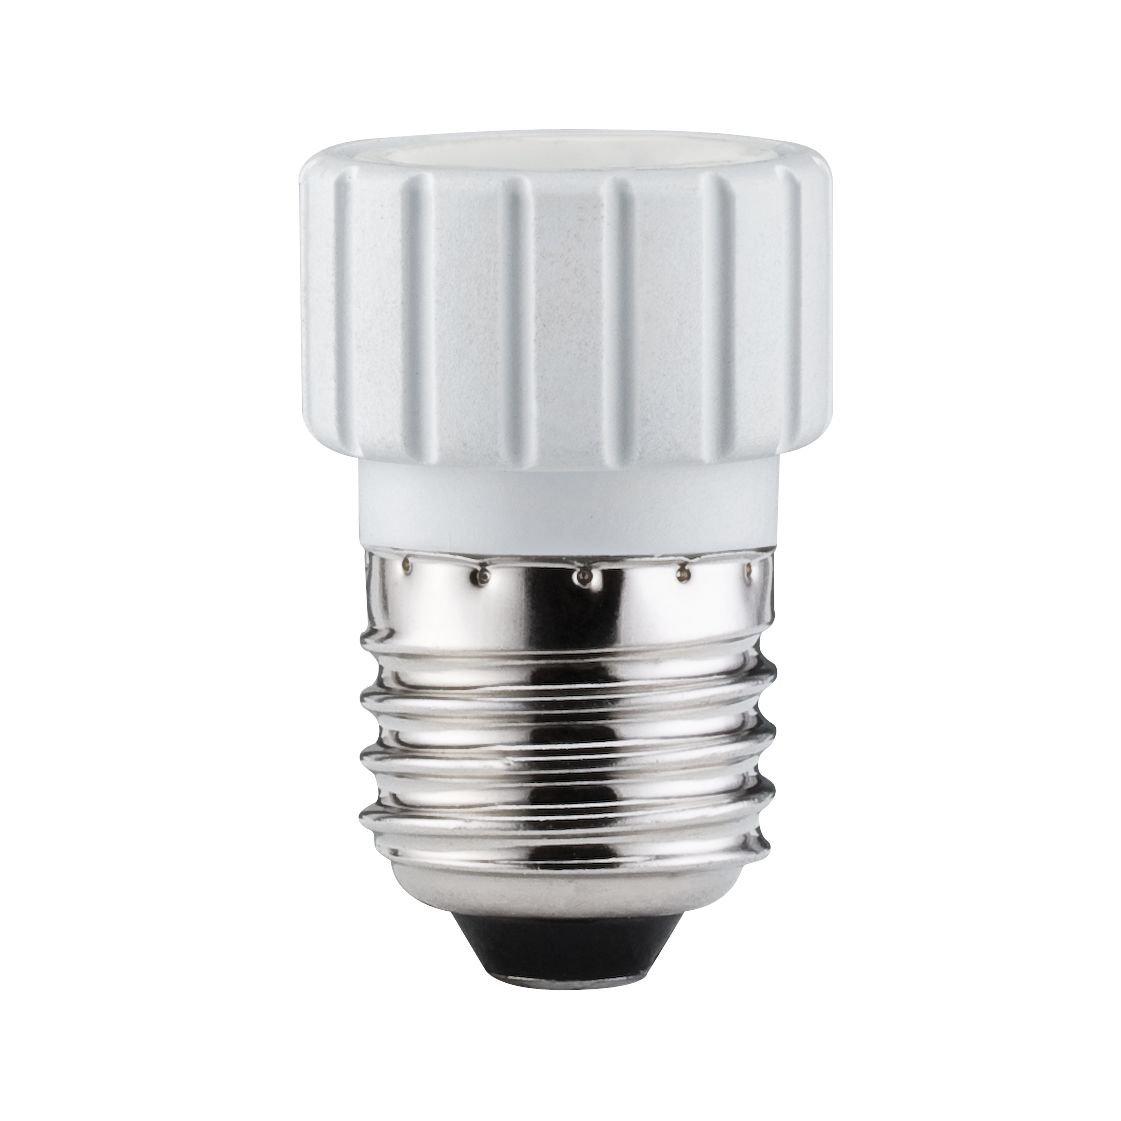 Adapteur de culot E27 en GU10 blanc